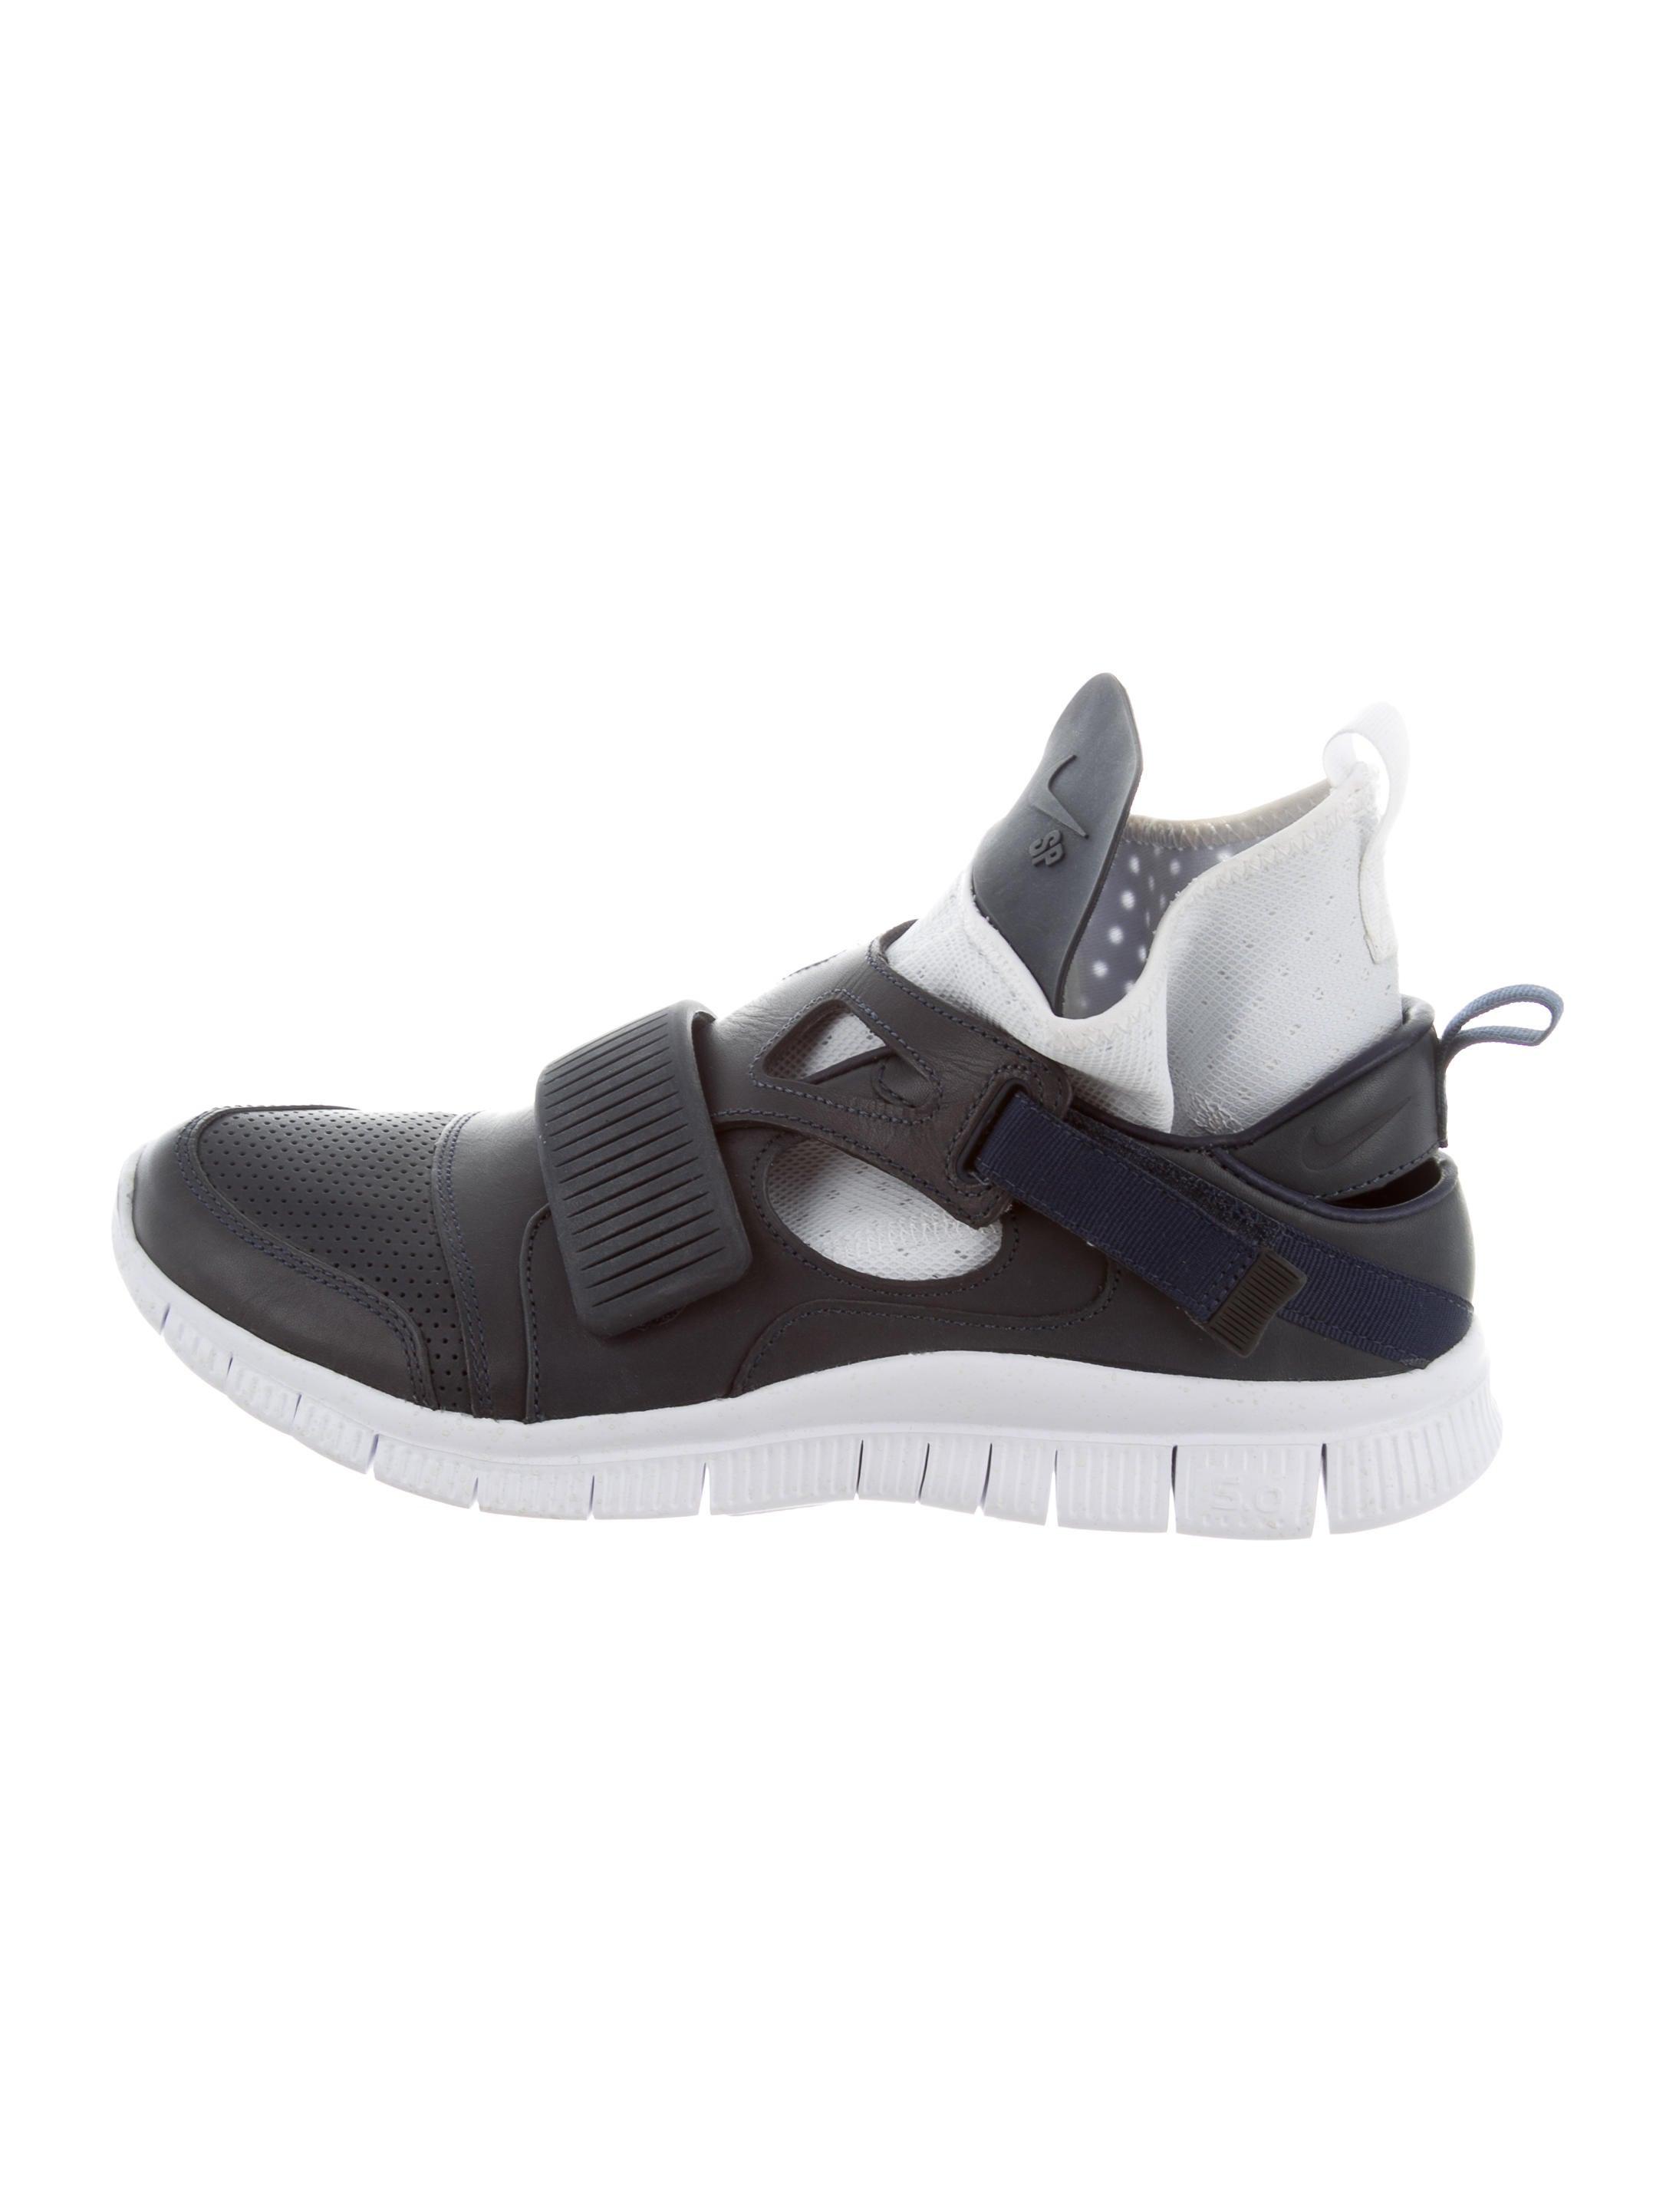 the latest fdce9 3ce35 Nike Air Jordan 5 Retro White Cement Black True Red Shoes Nike